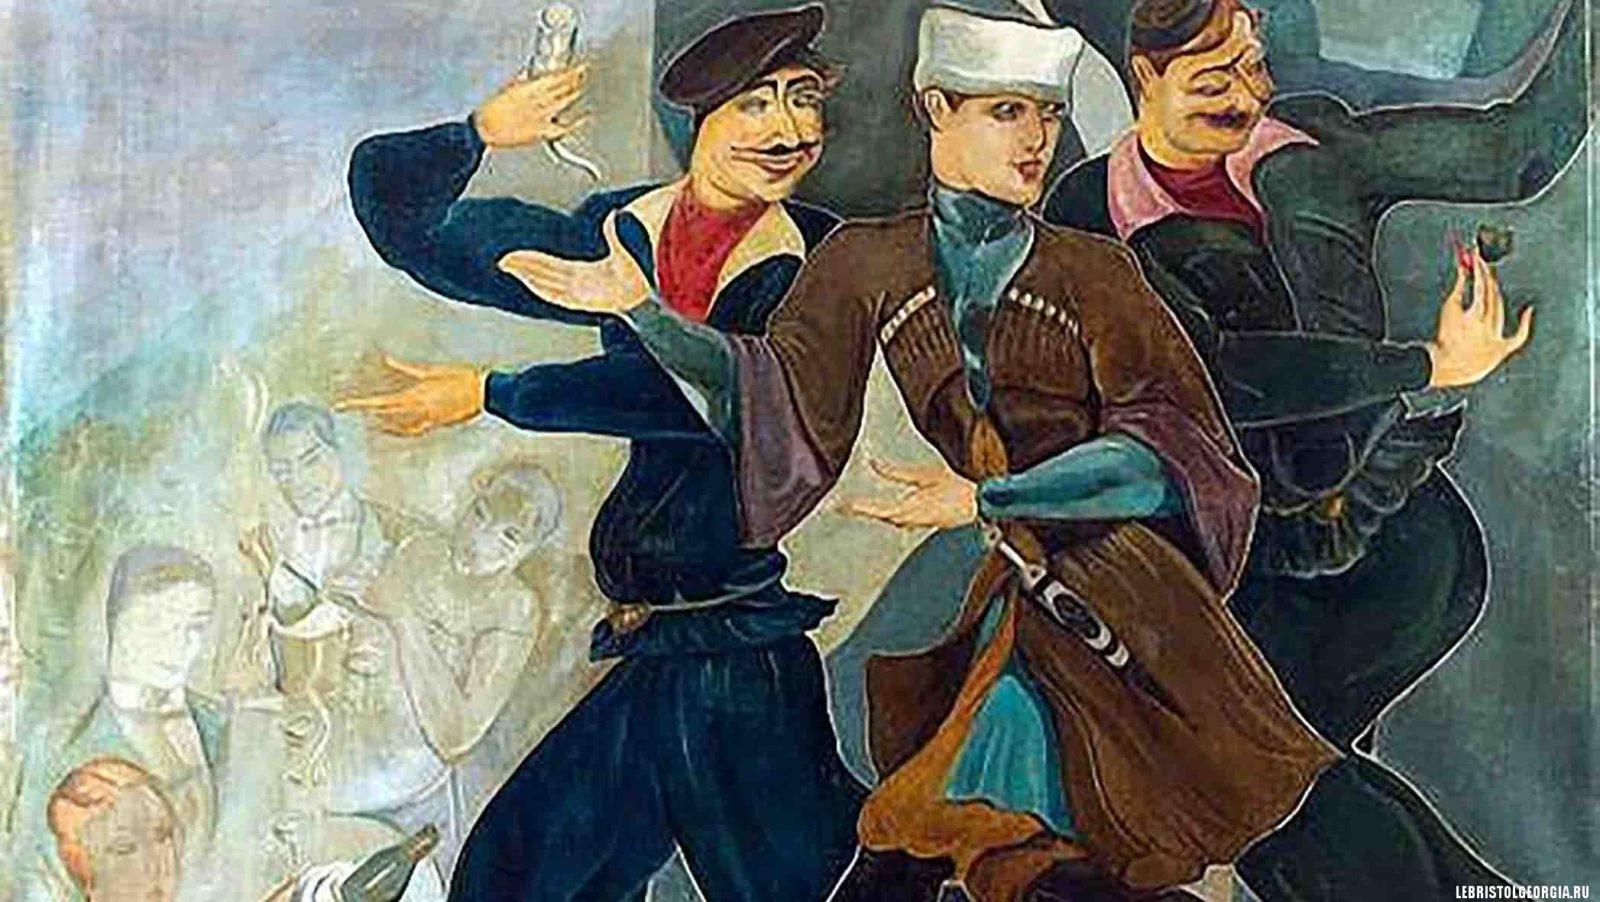 художник ладо гудиашвили